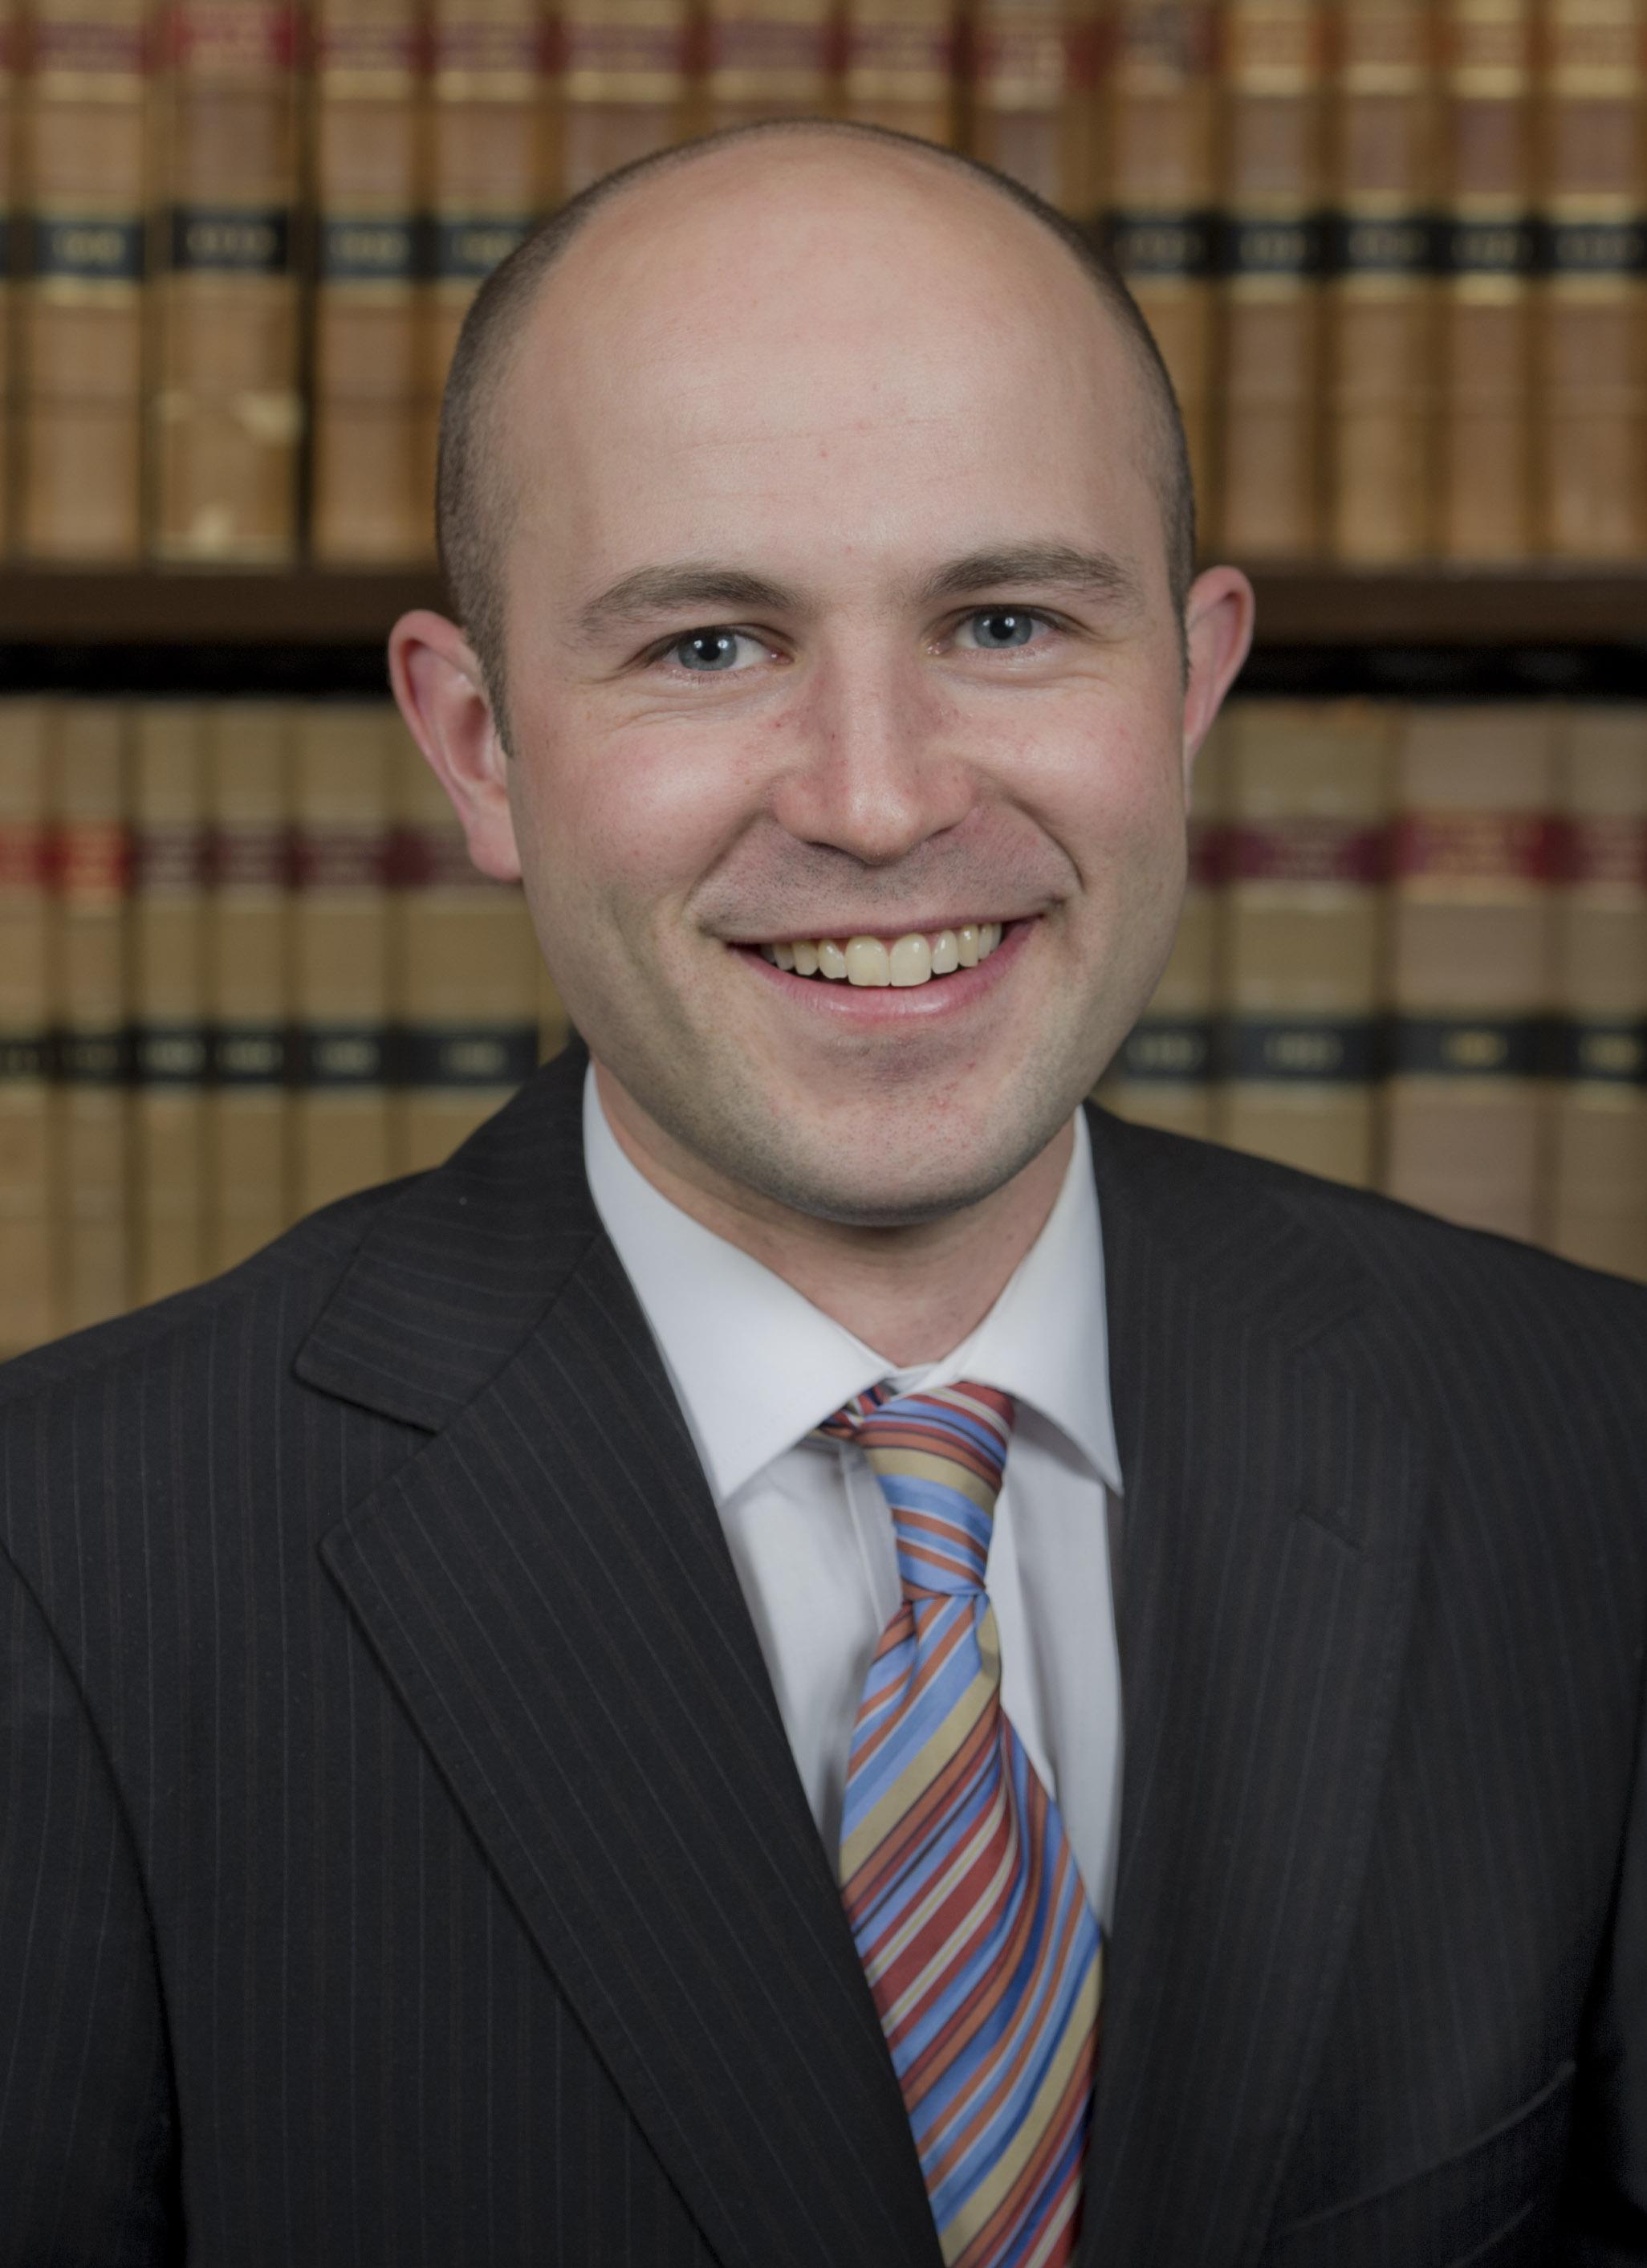 Matthew Albert, BA, LLB (Melb), MSc (Oxon)